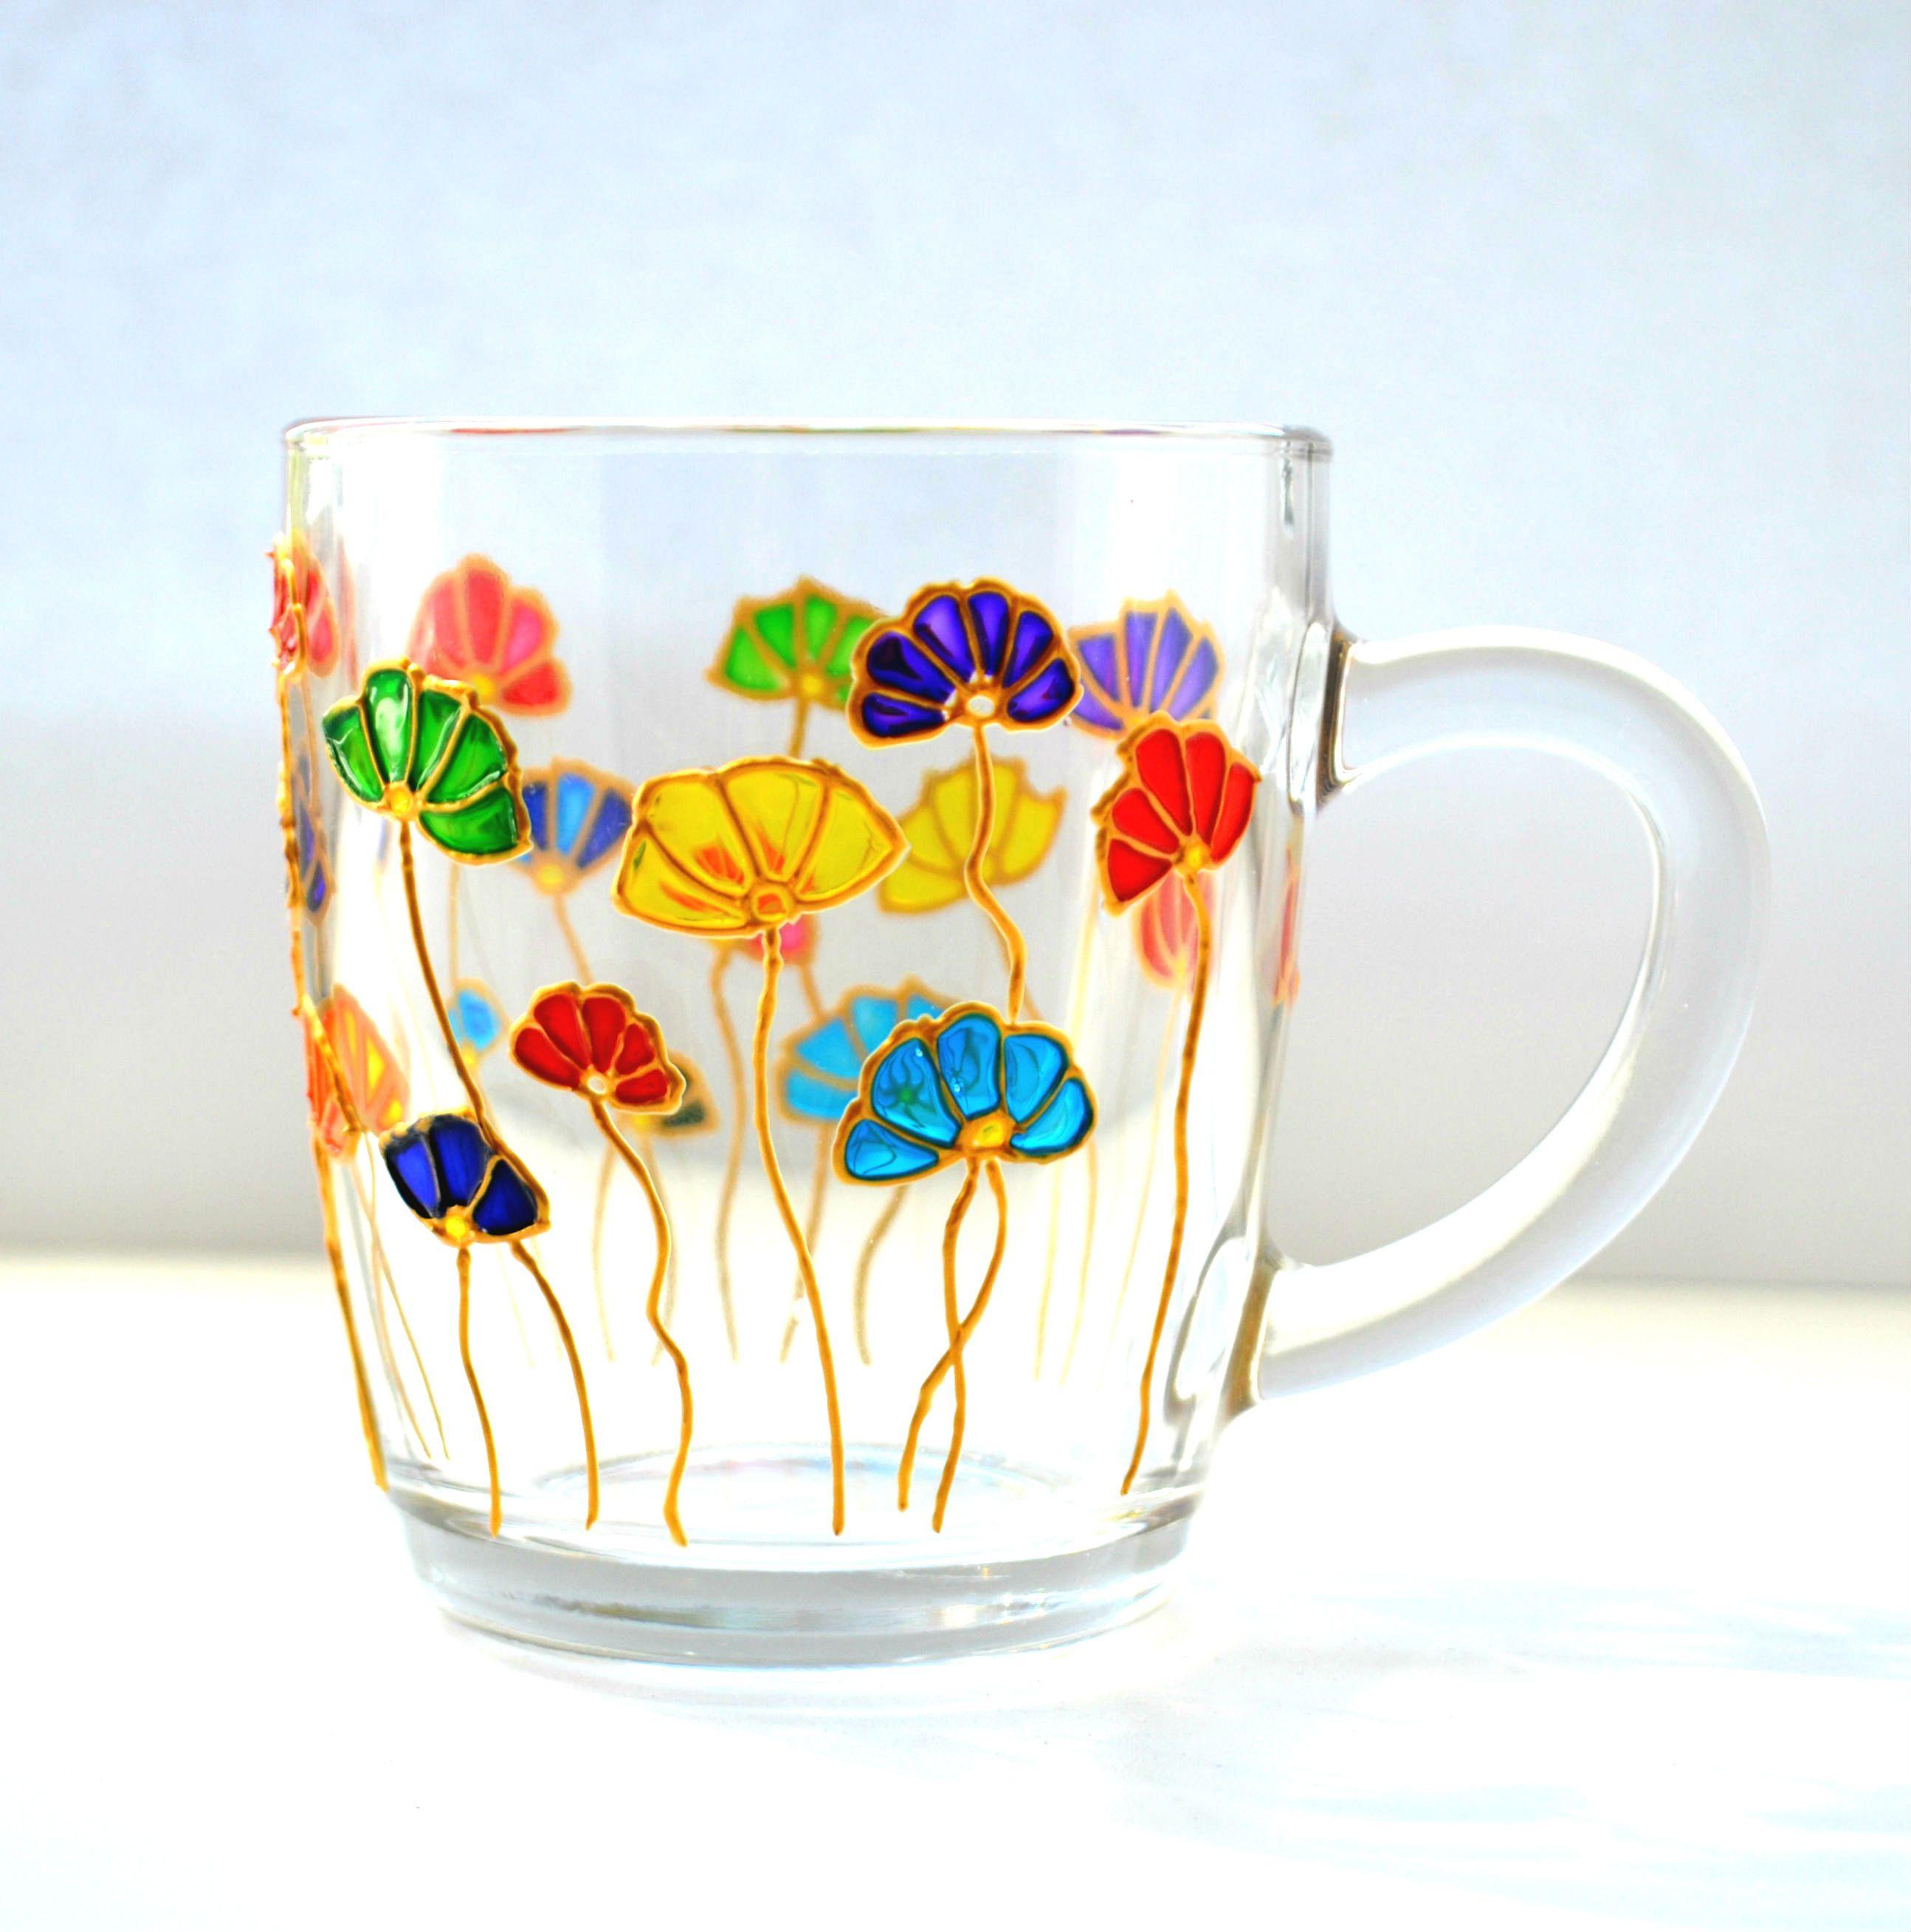 Floral Mug Painted Glass Mug Colorful Mugs Summer Florals